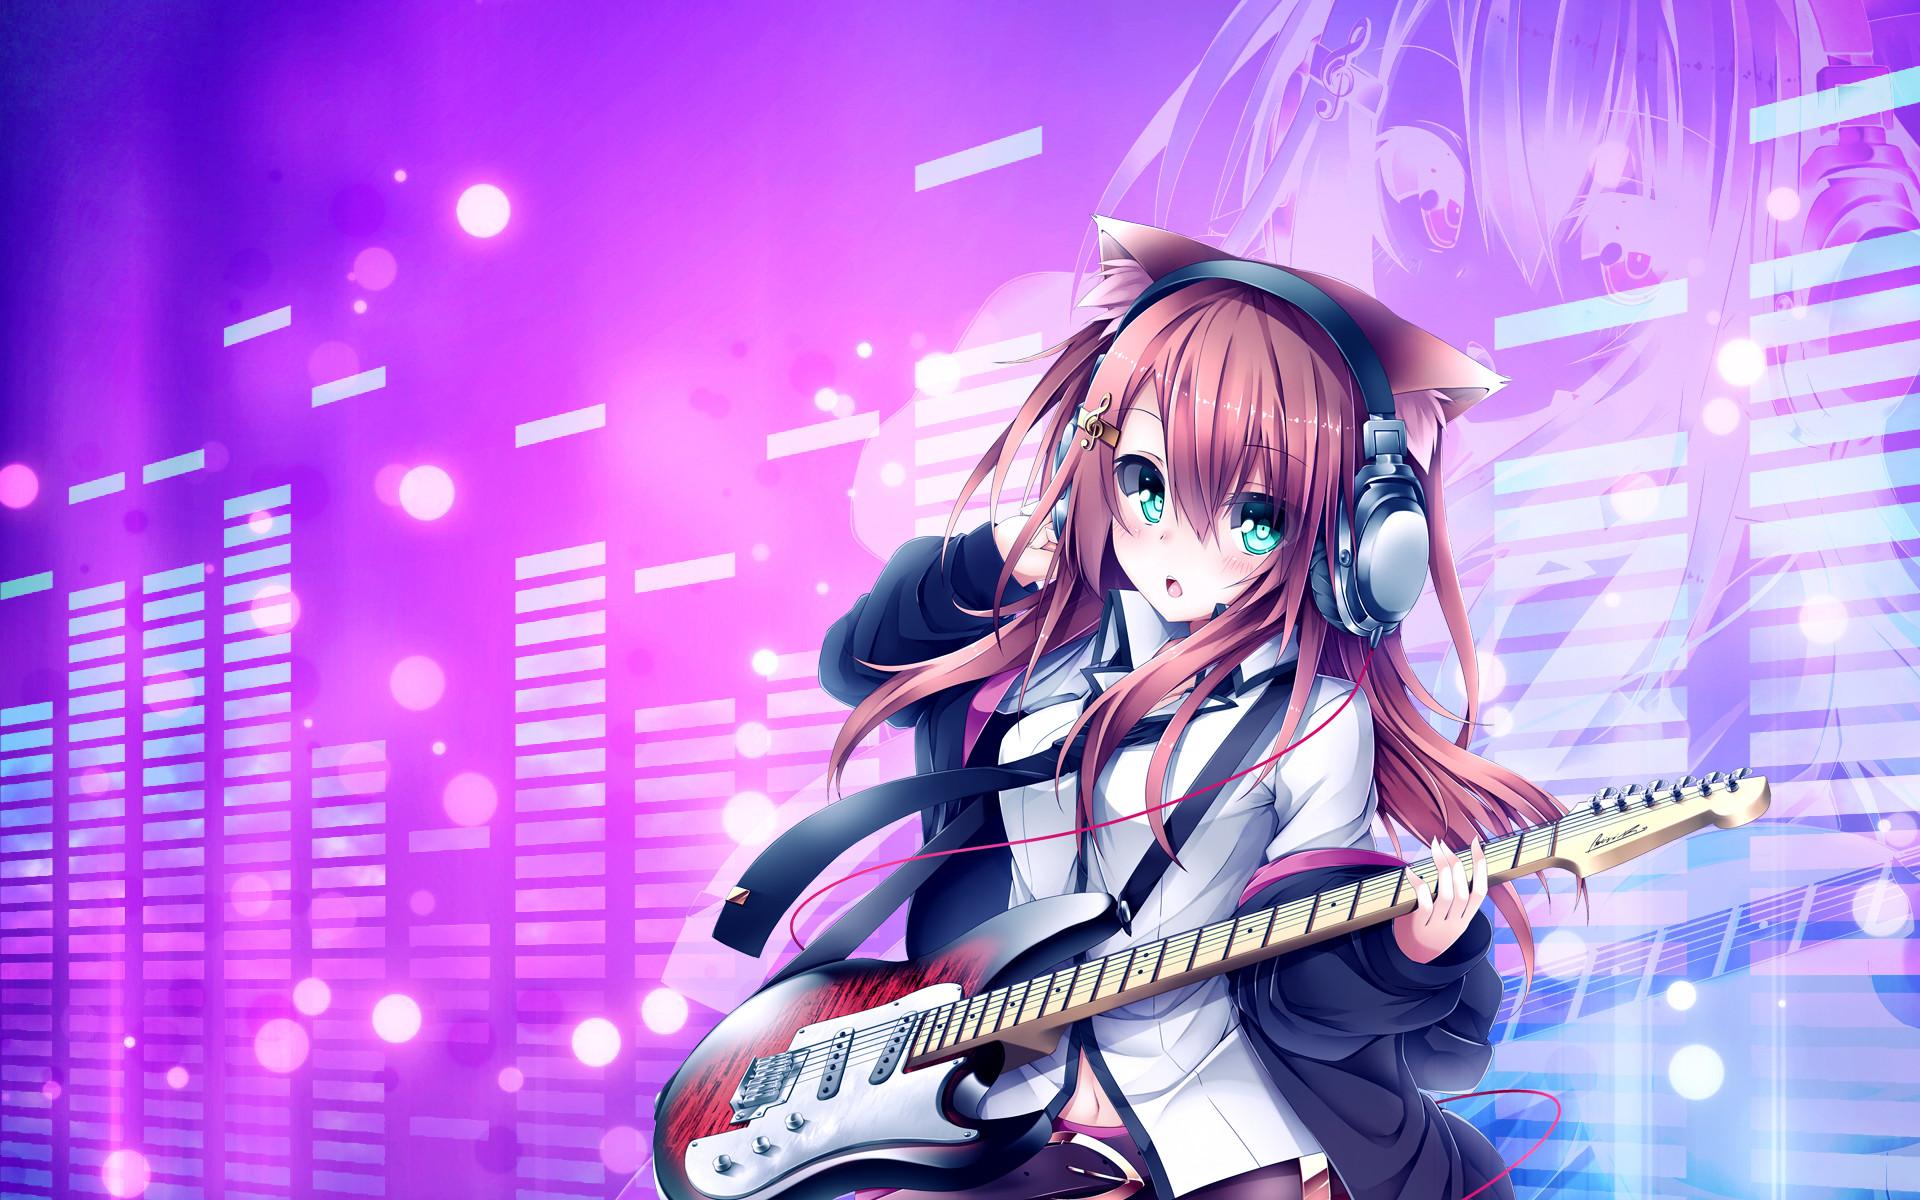 Res: 1920x1200, Guitar Anime Girl Wallpaper HD Wallpaper